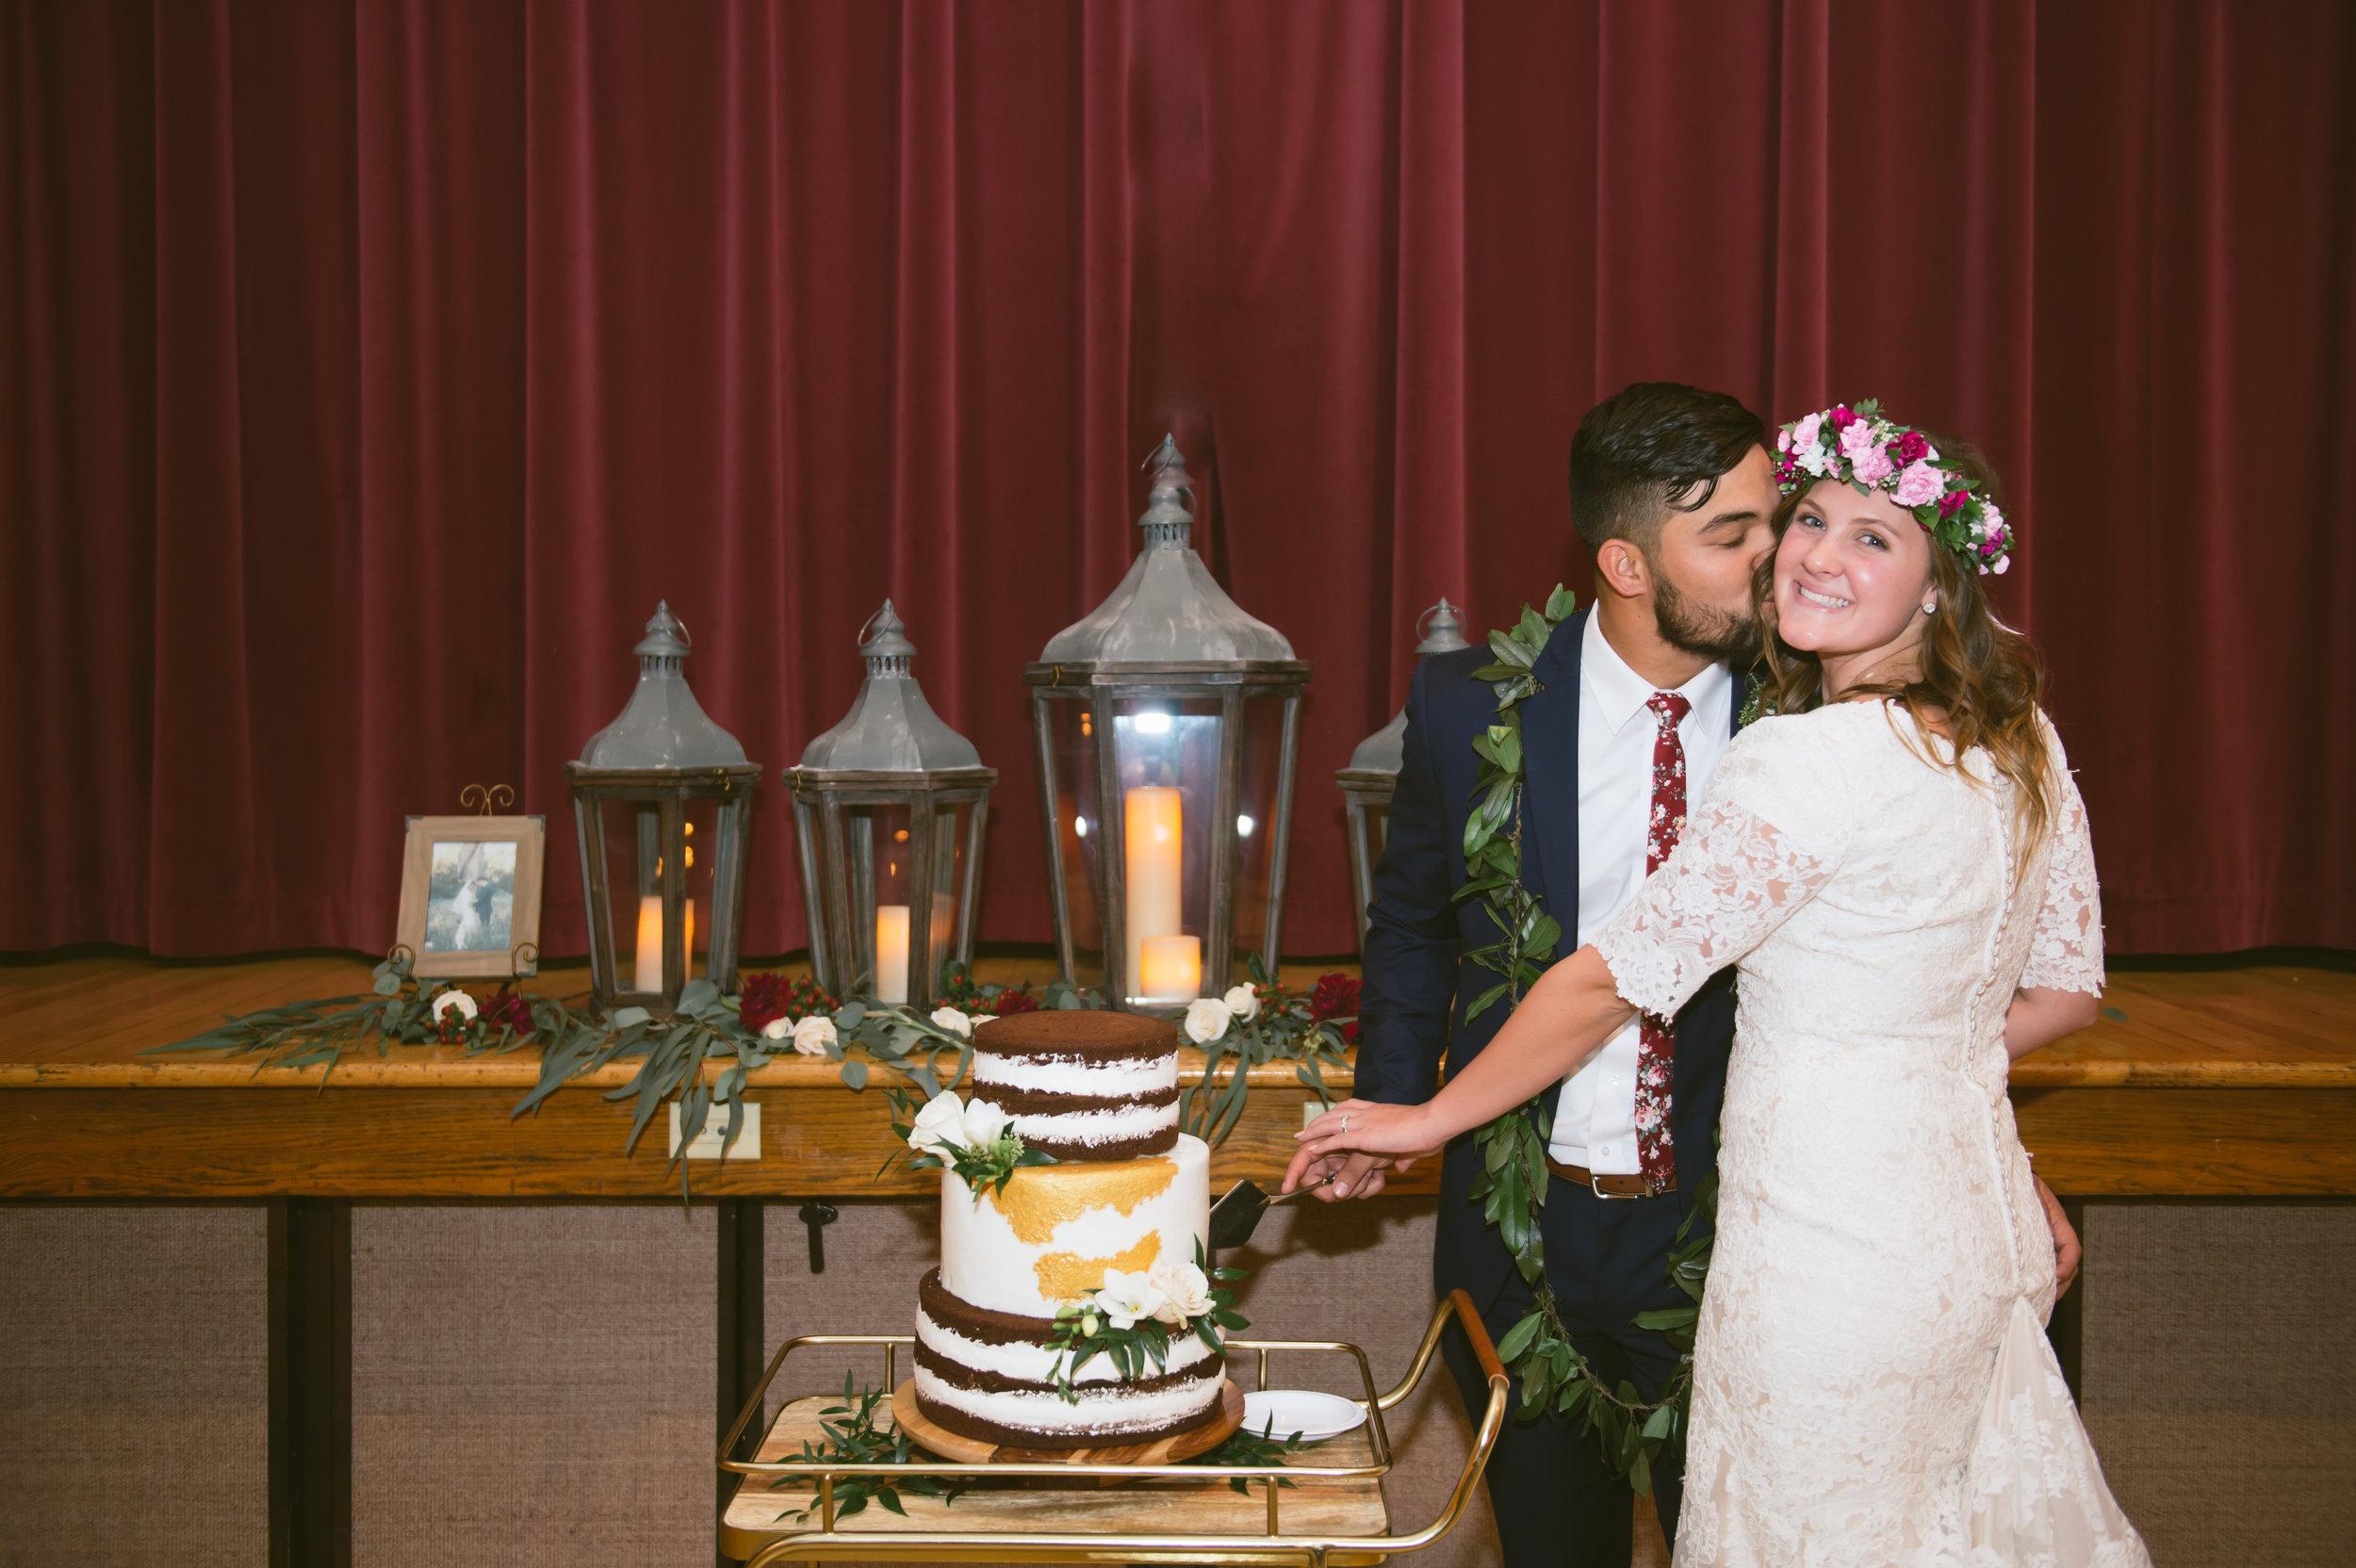 26Newport Beach LDS Temple Wedding Pictures.jpg